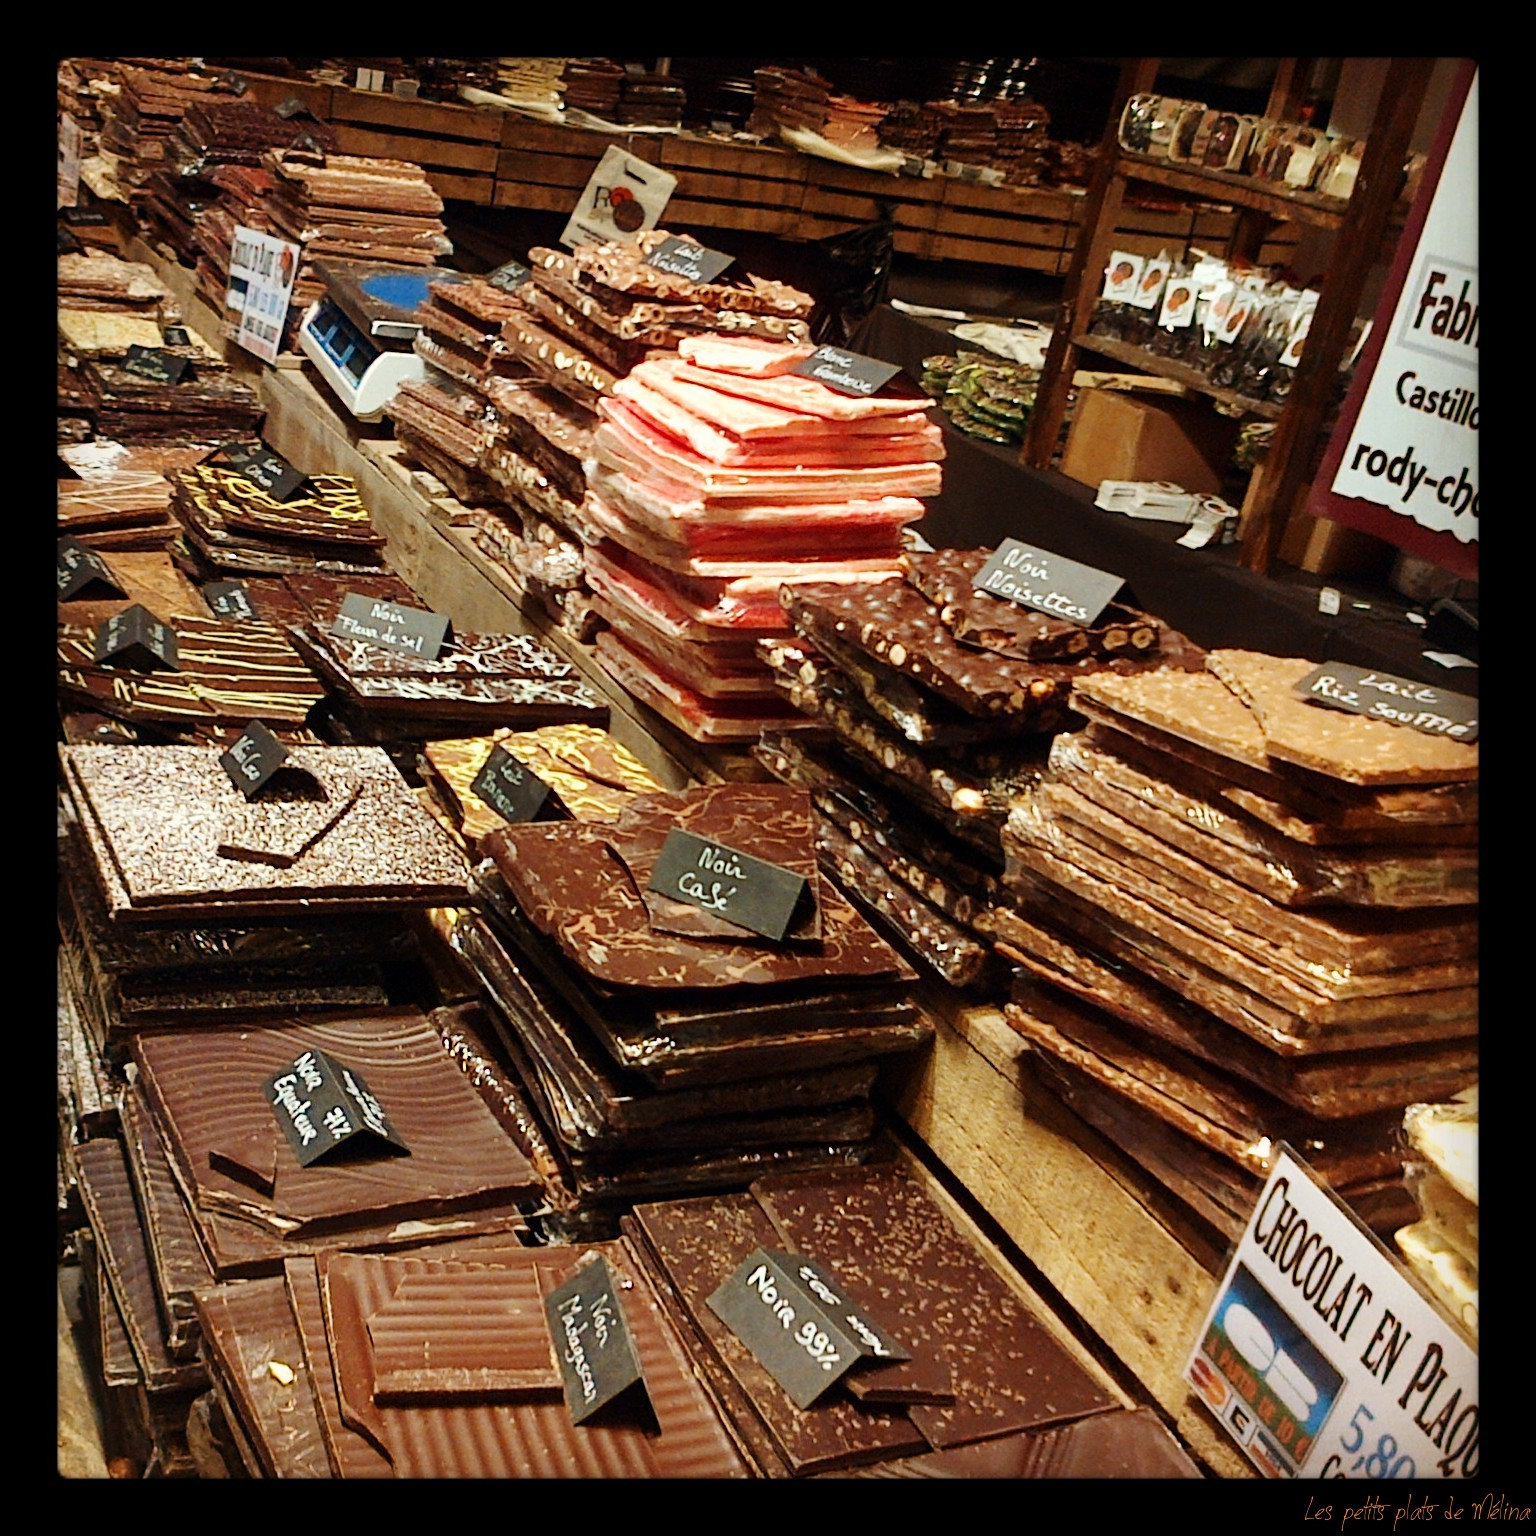 Rody Chocolaterie - Les Petits Plats de Mélina